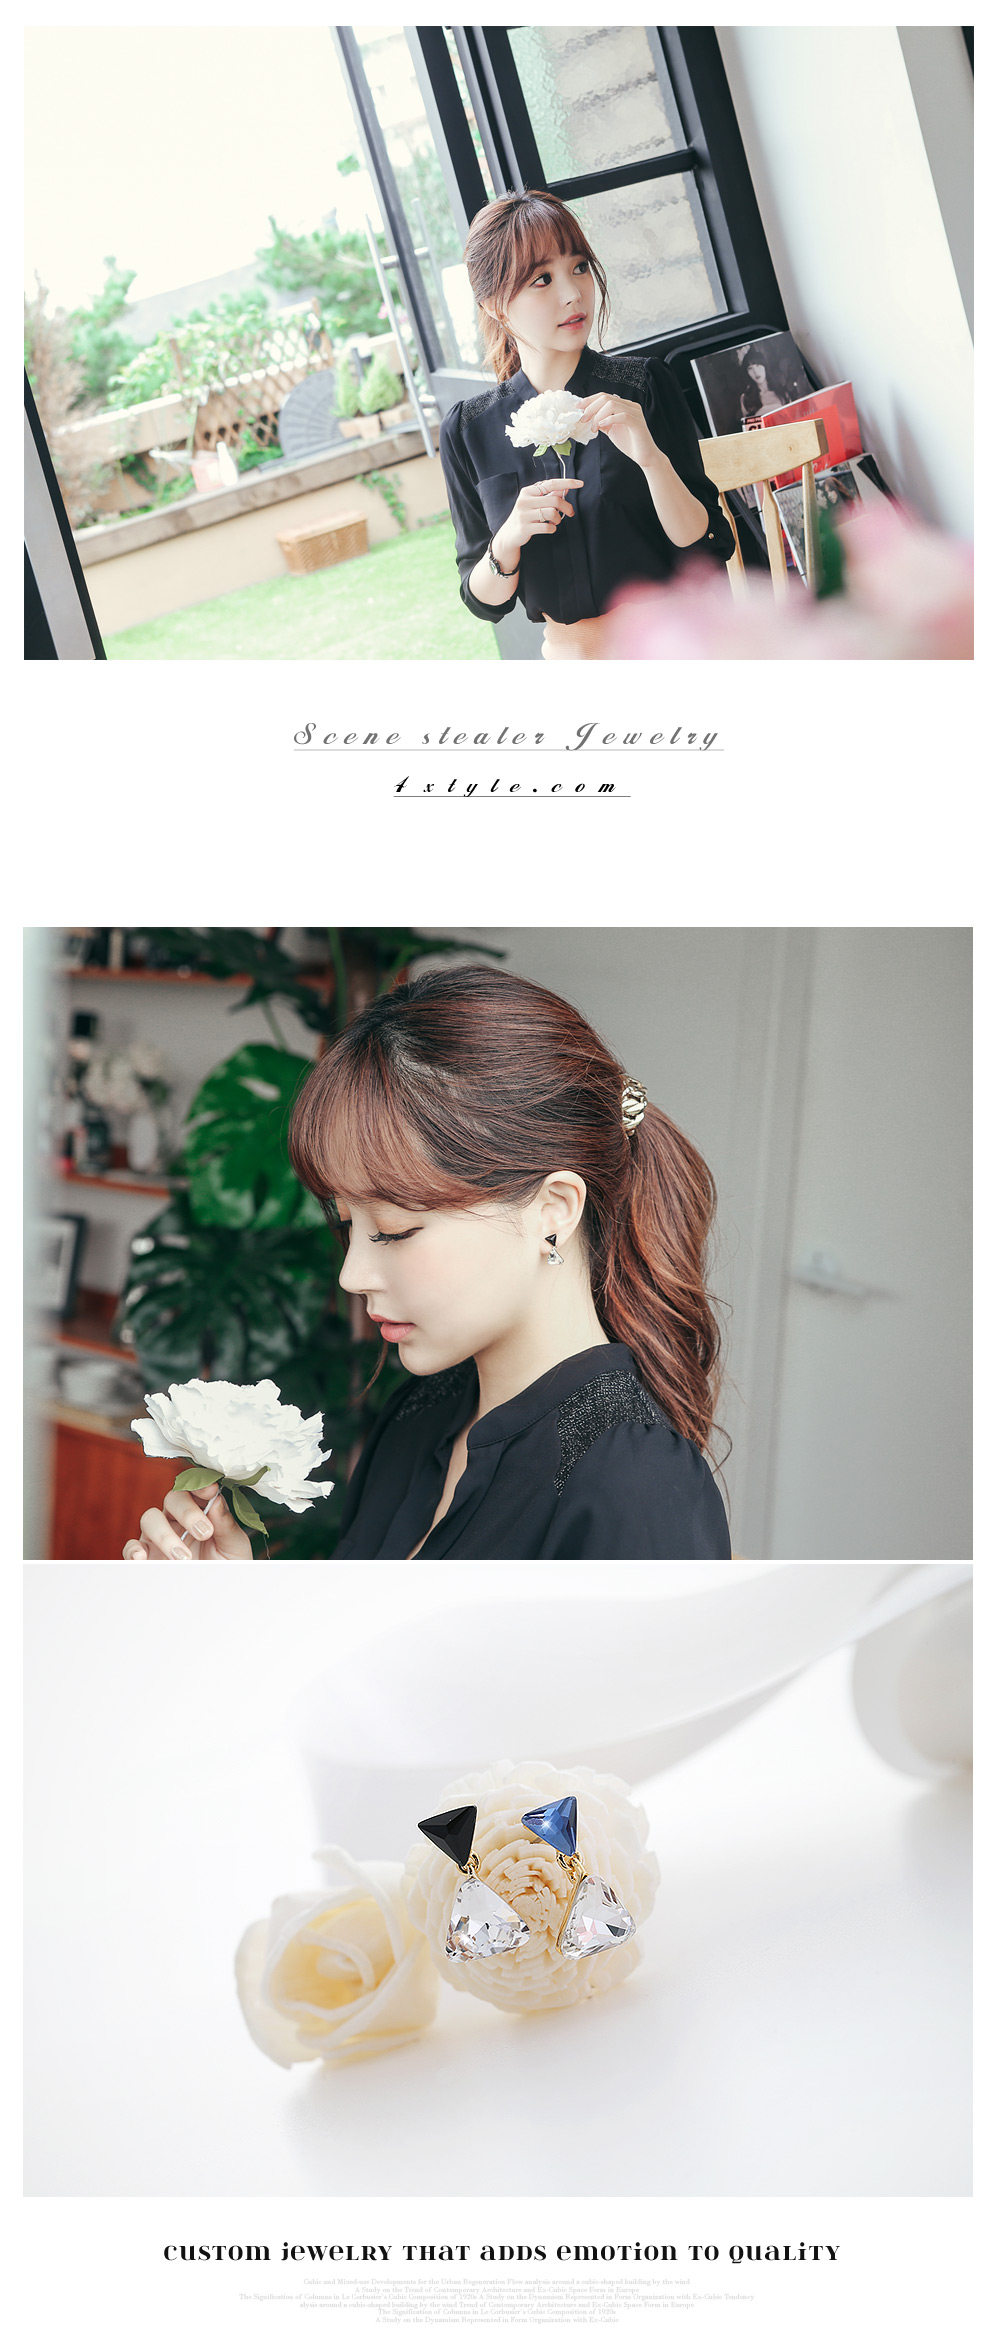 [ 4xtyle ] Swarovski Triangle Earring, 2 Colors